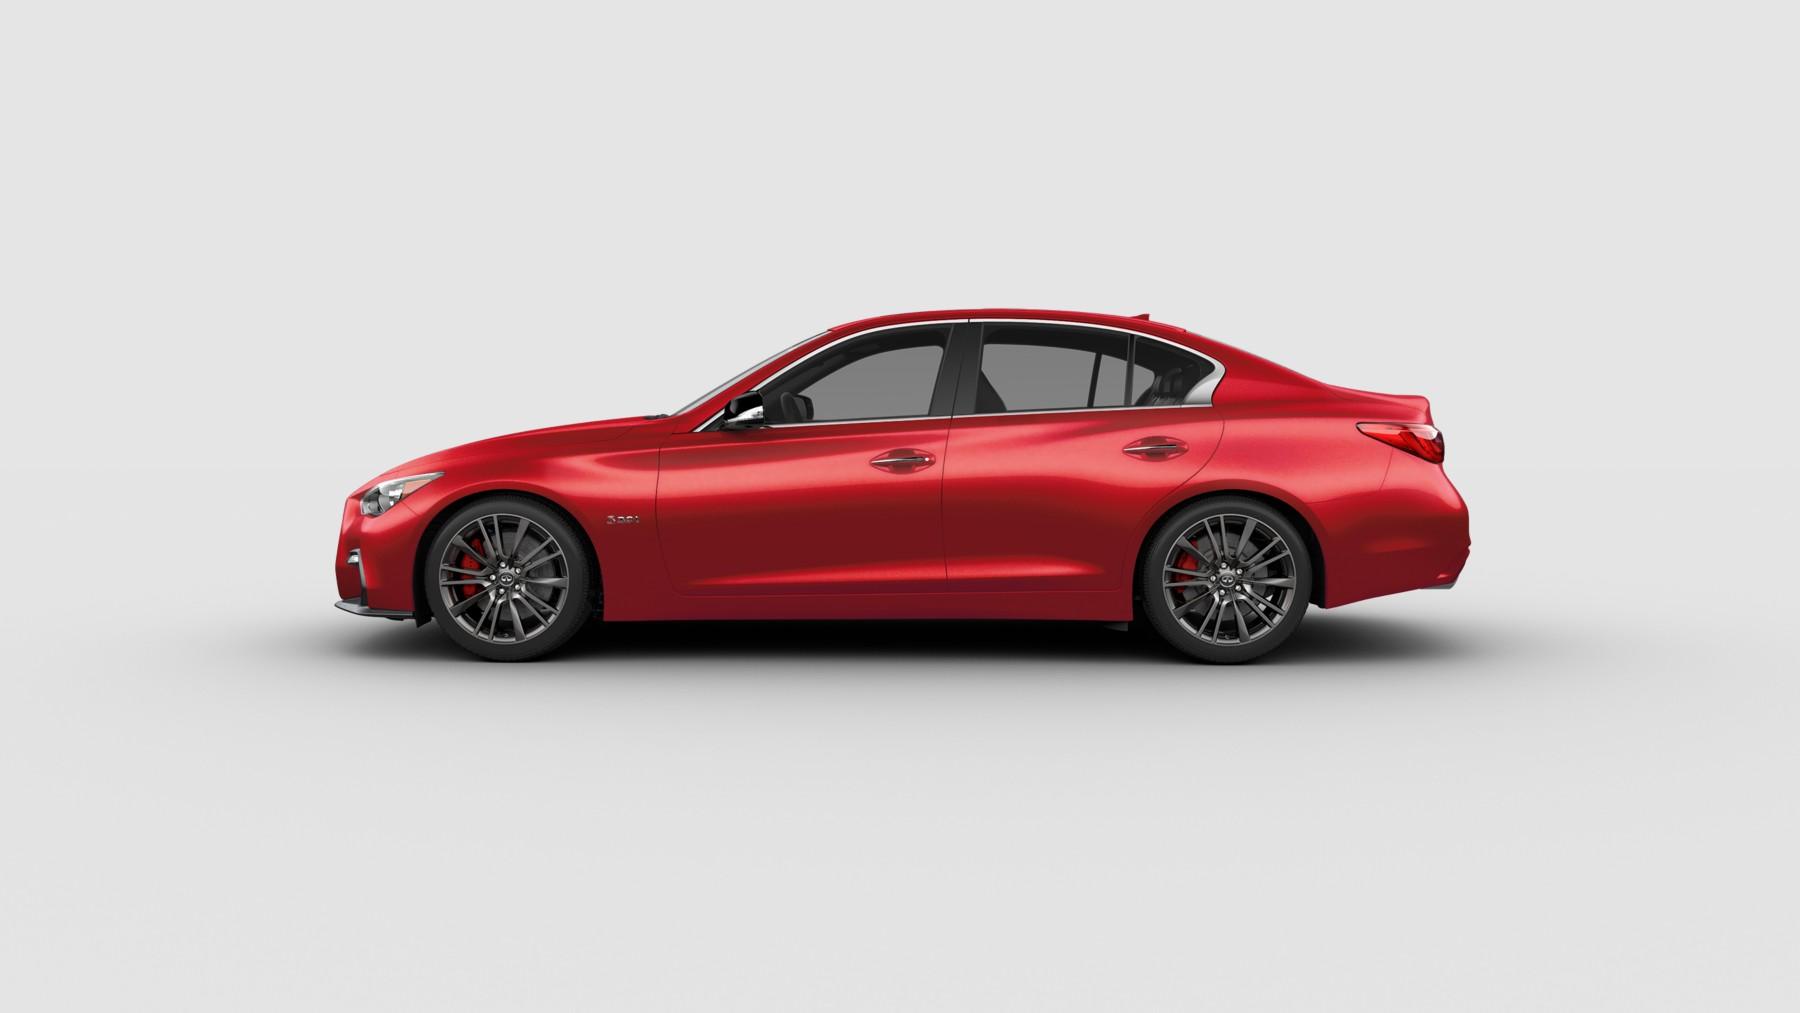 2019 Q50 RED SPORT 400 AWD